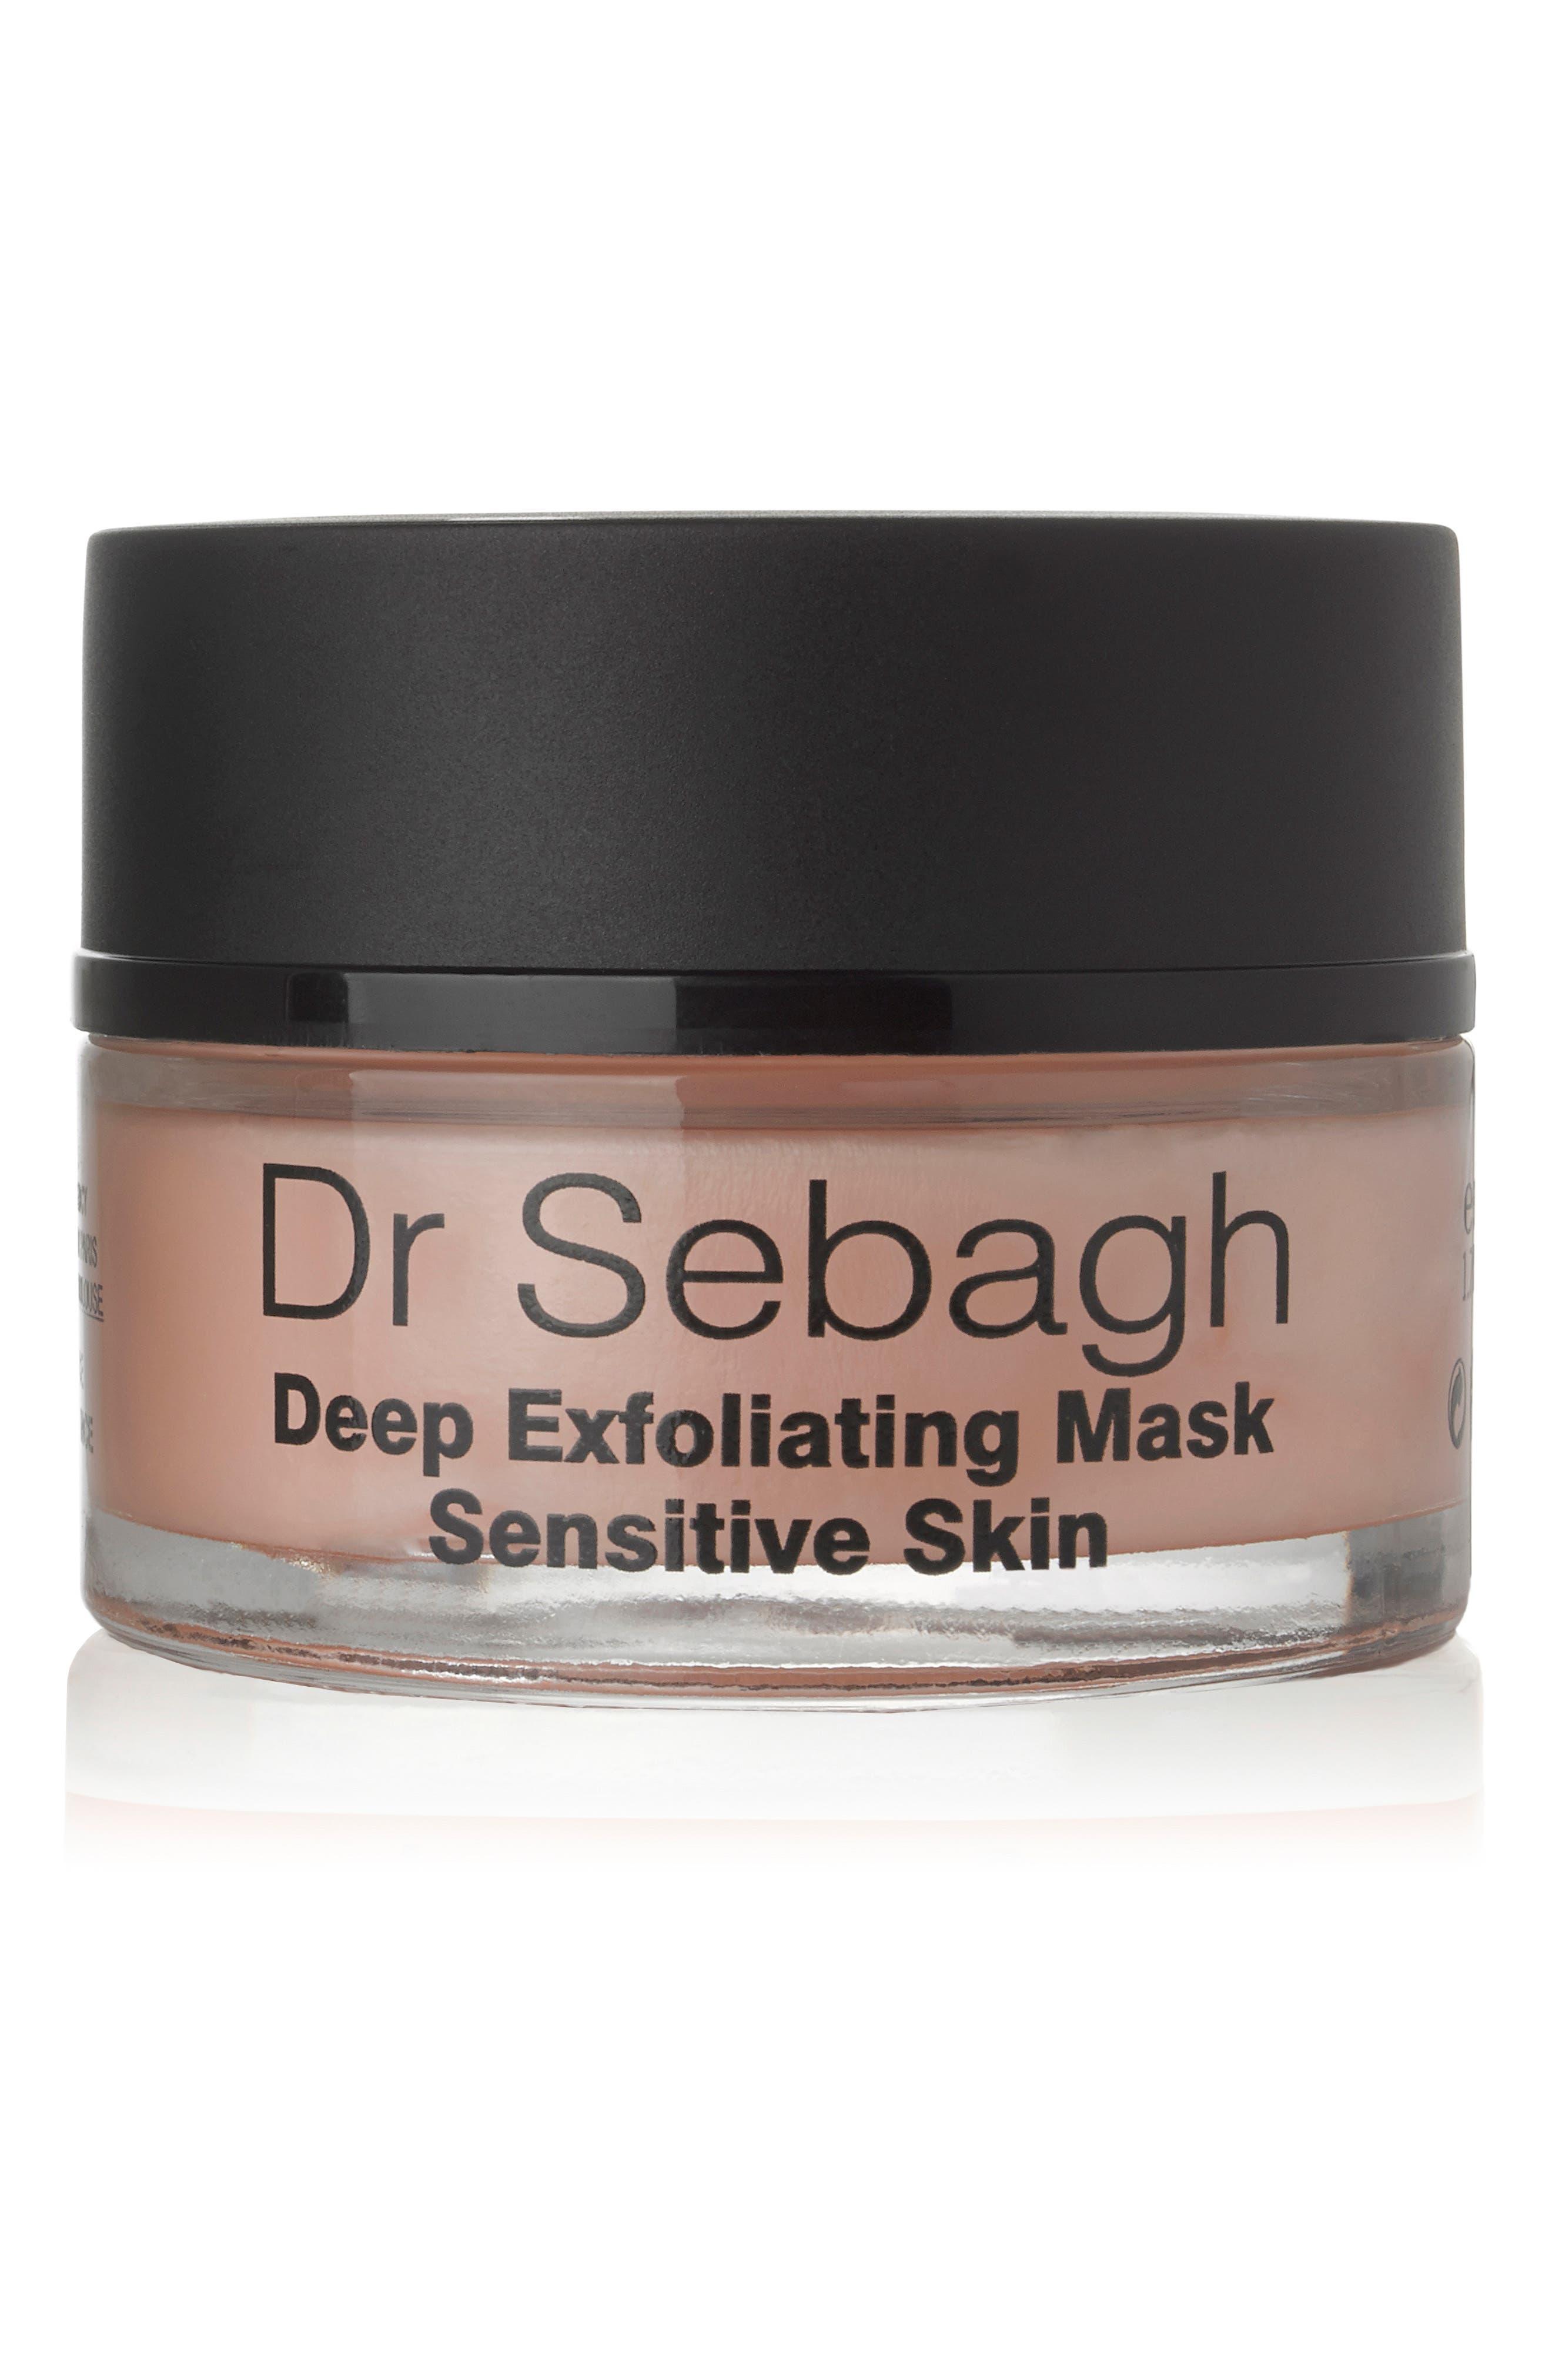 Deep Exfoliating Mask For Sensitive Skin